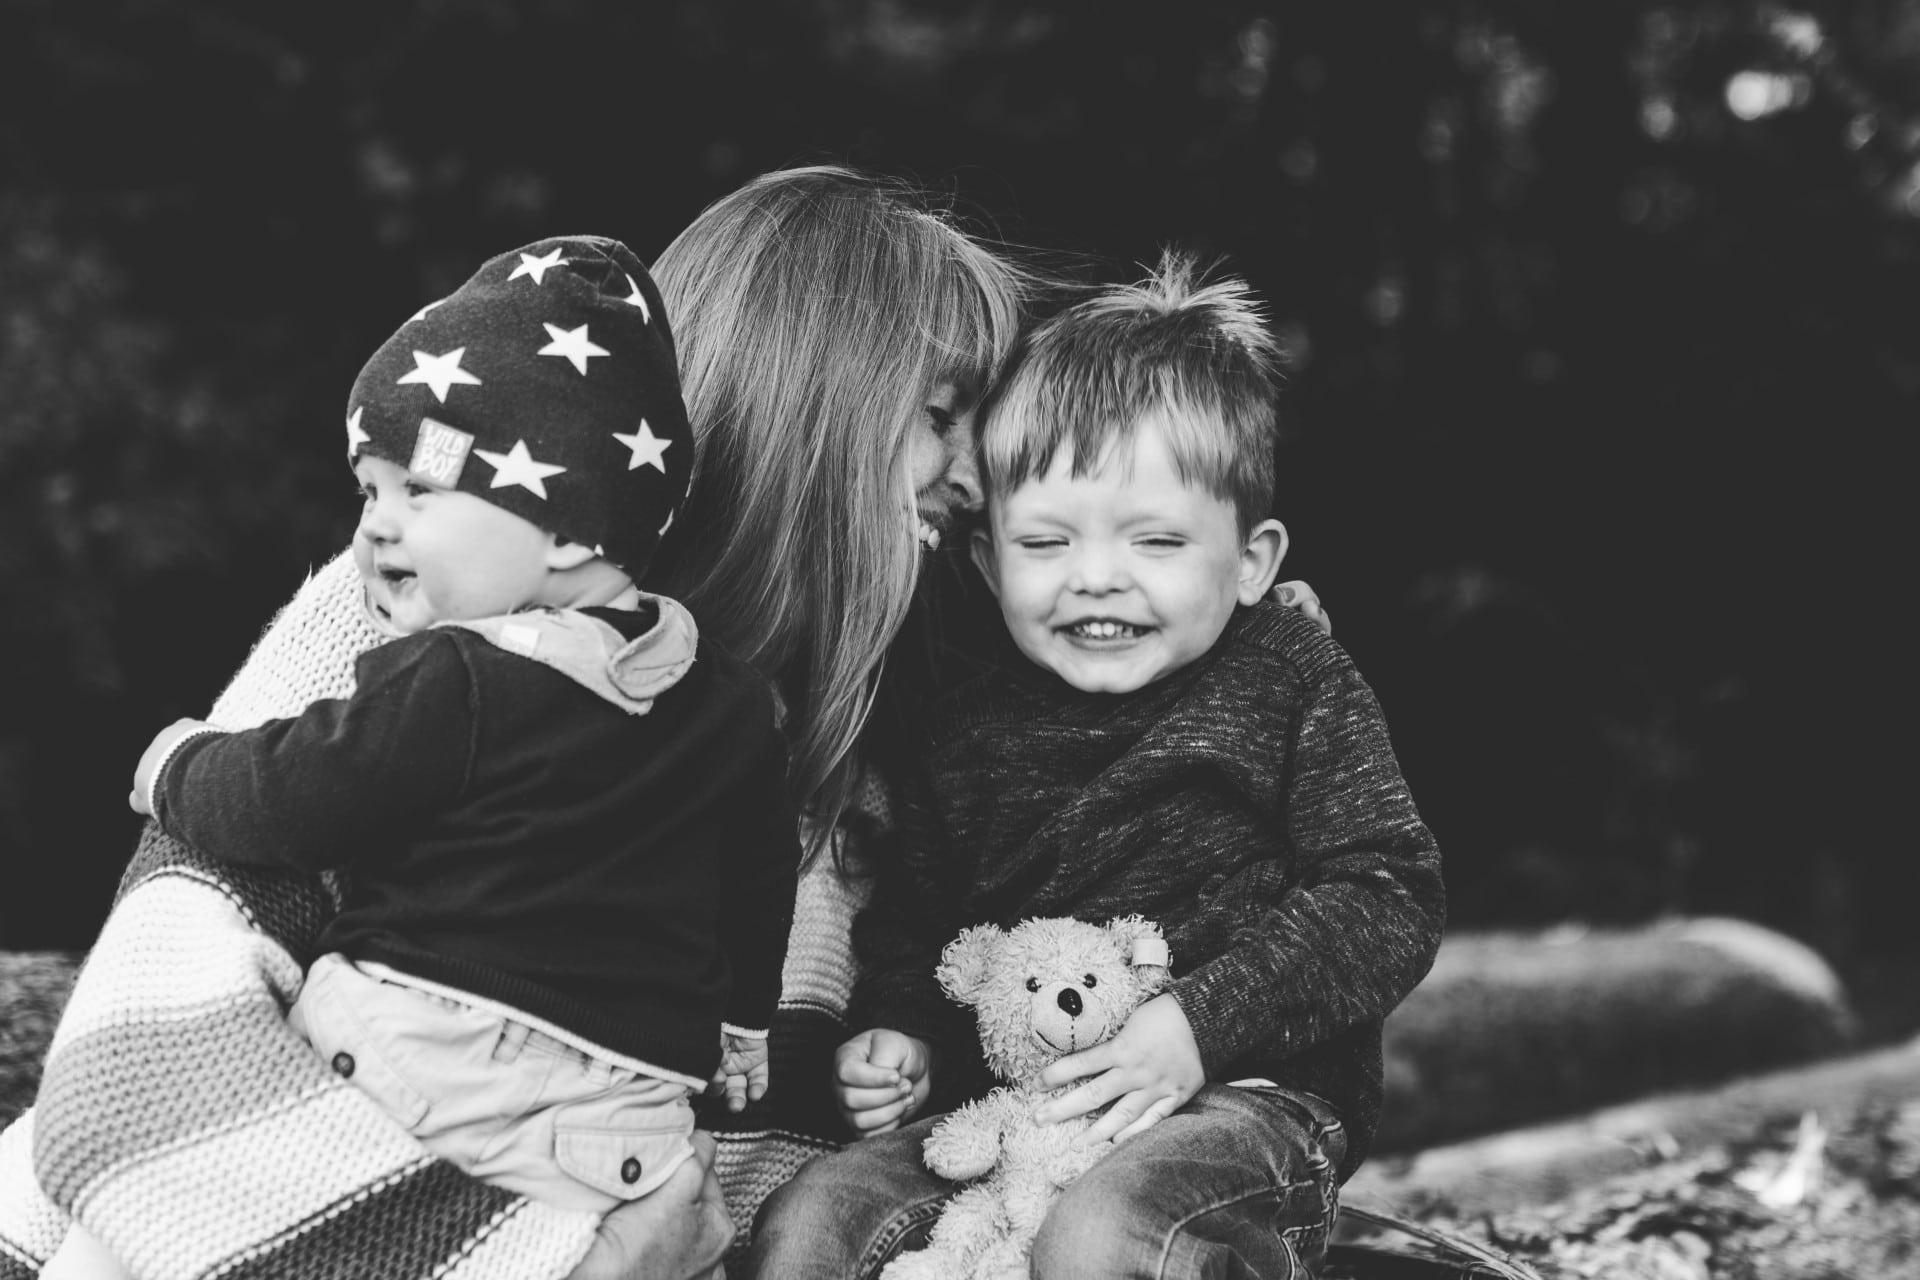 970-Sinneszauber-Photographie-Familienfotos-9KOfYPM4